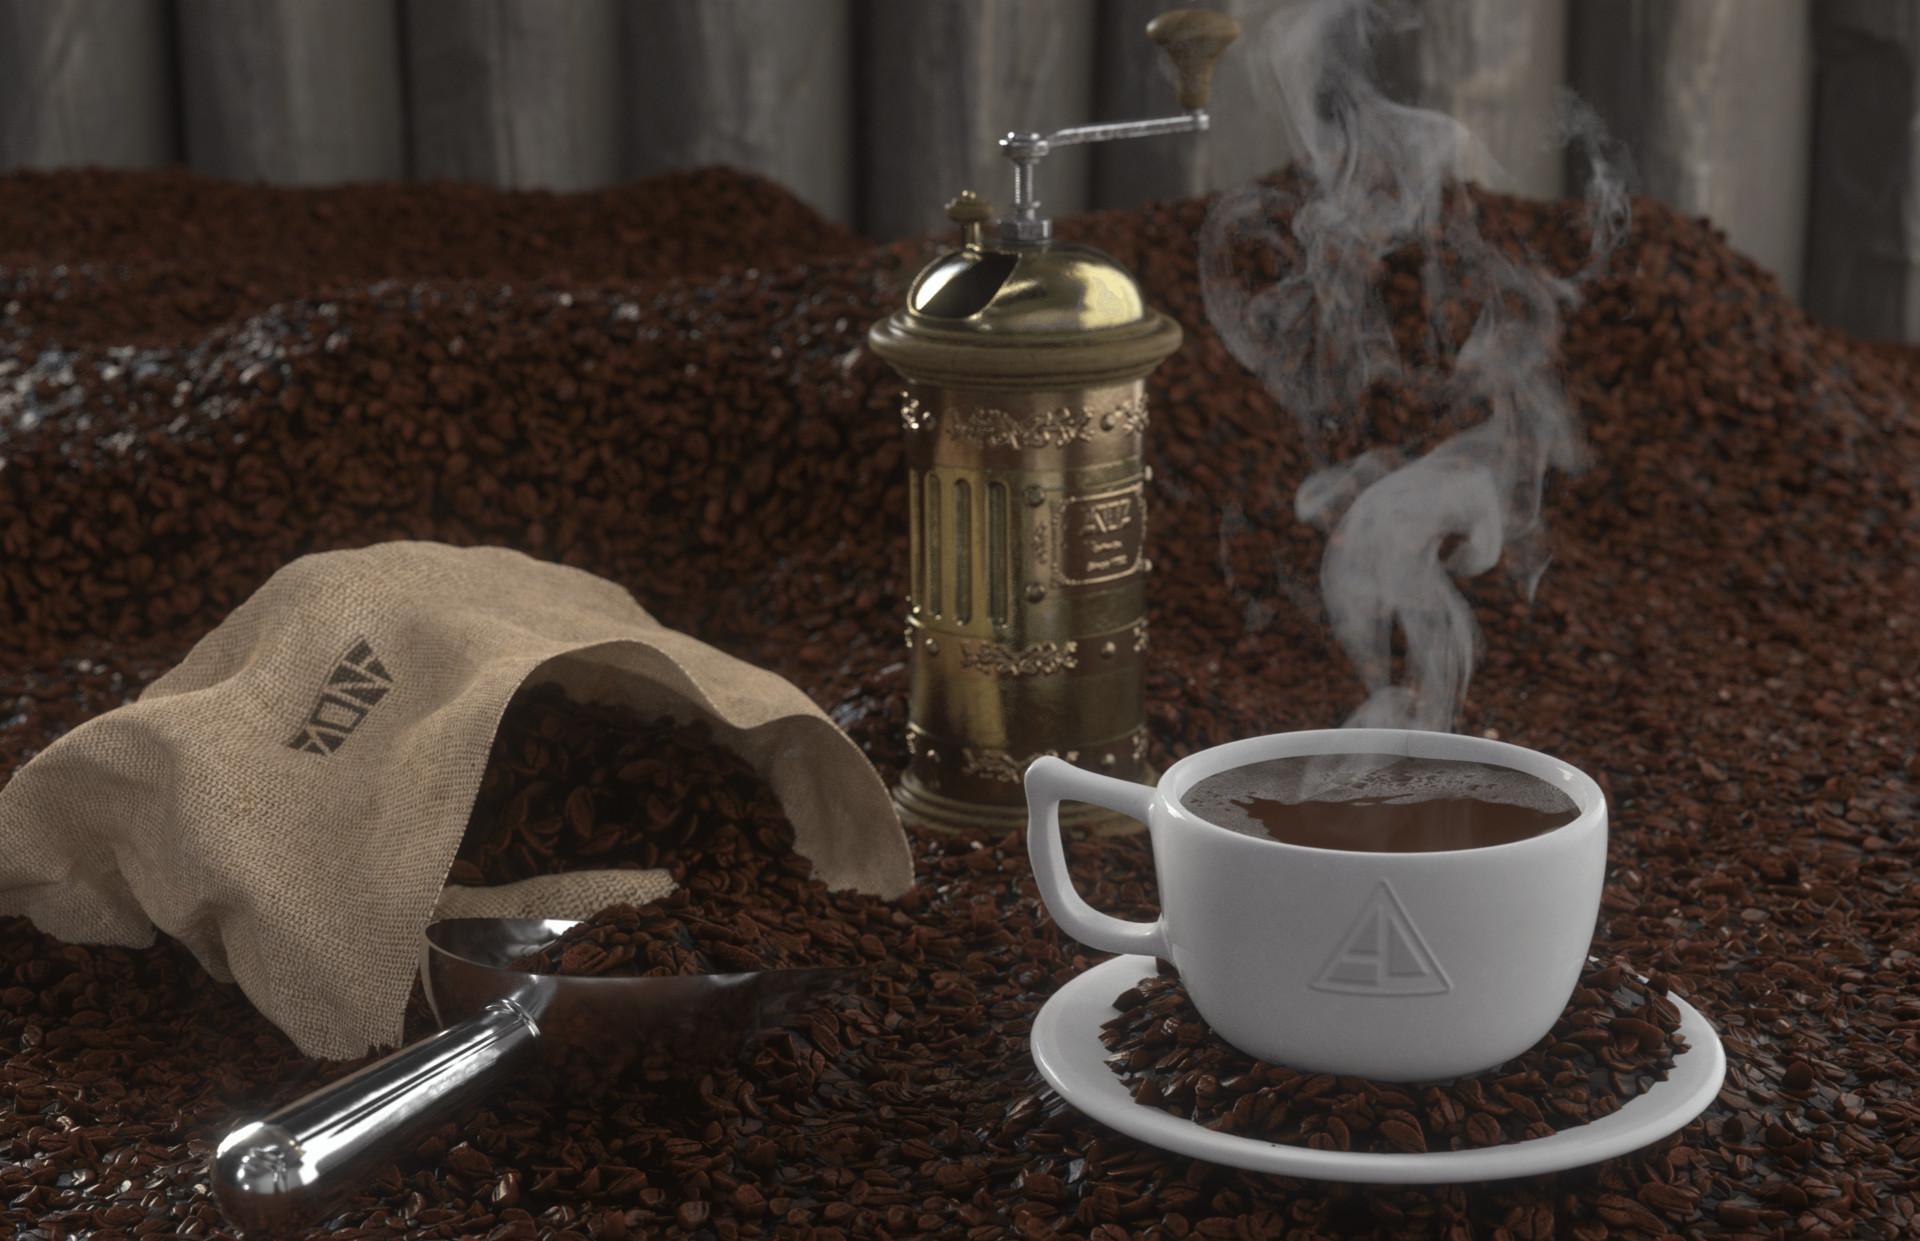 Cem tezcan anova coffee 00000